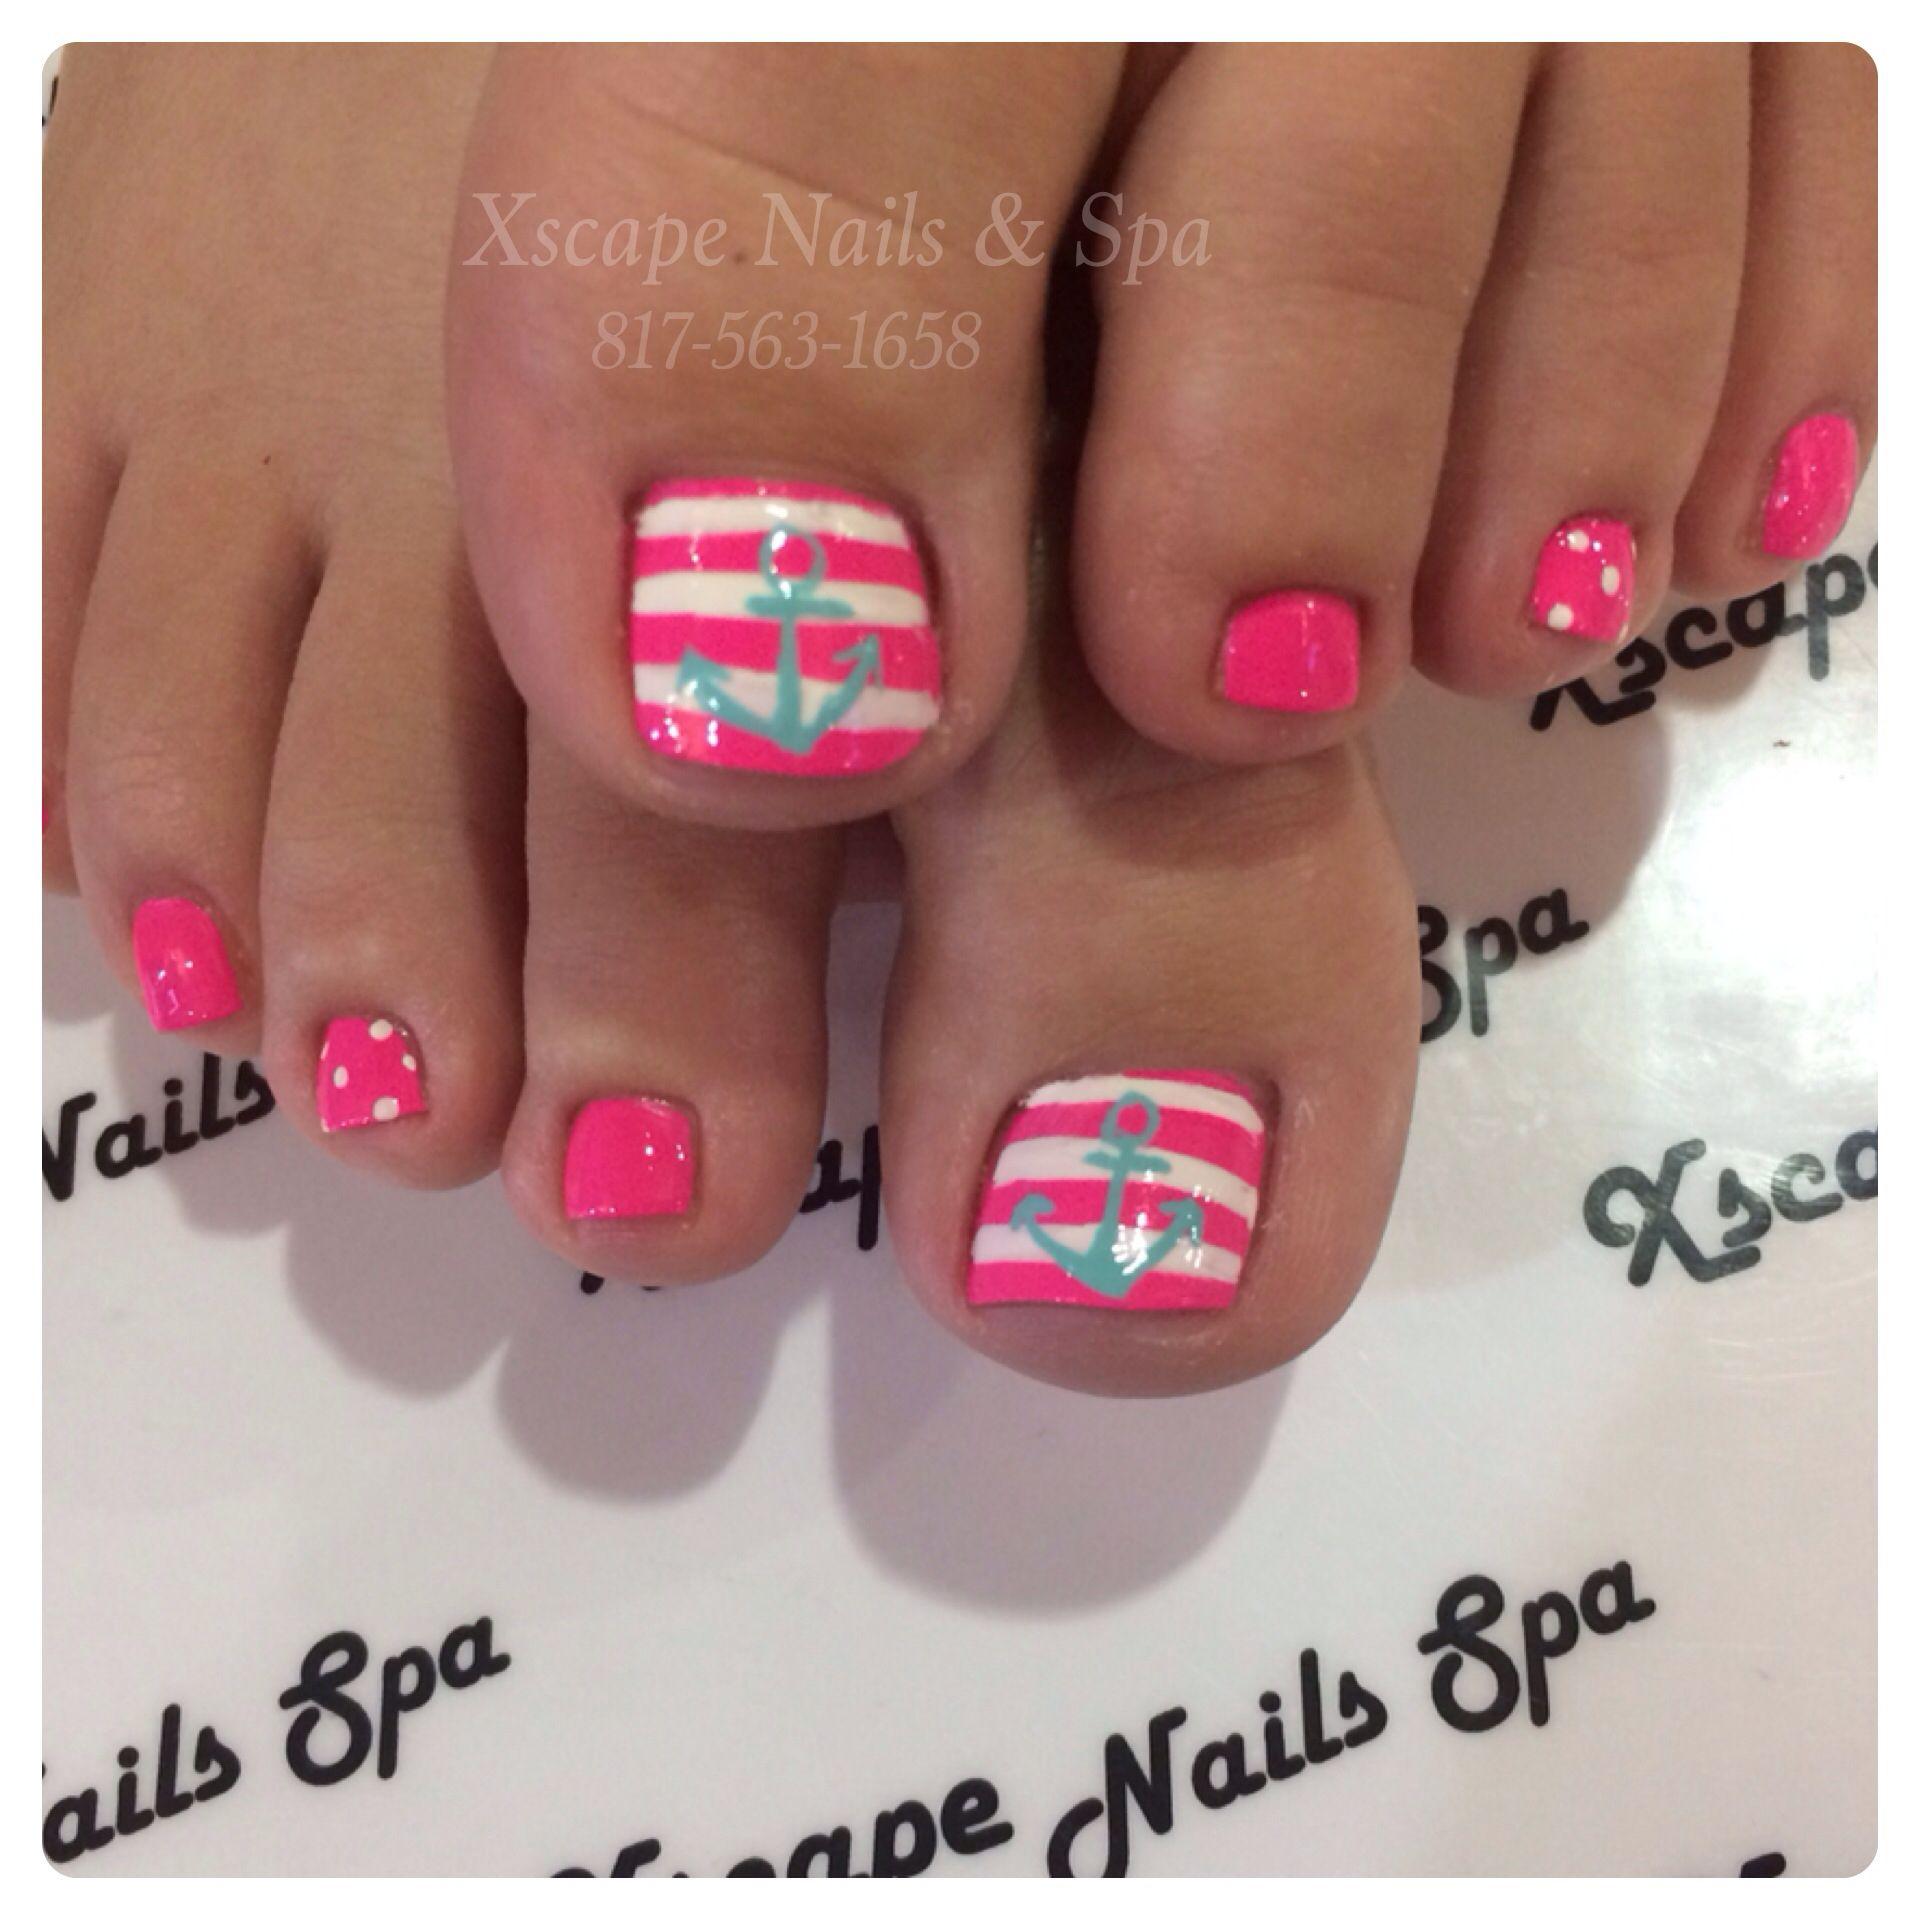 Cute Nail Designs With Anchors Anchor Nail Designs Share